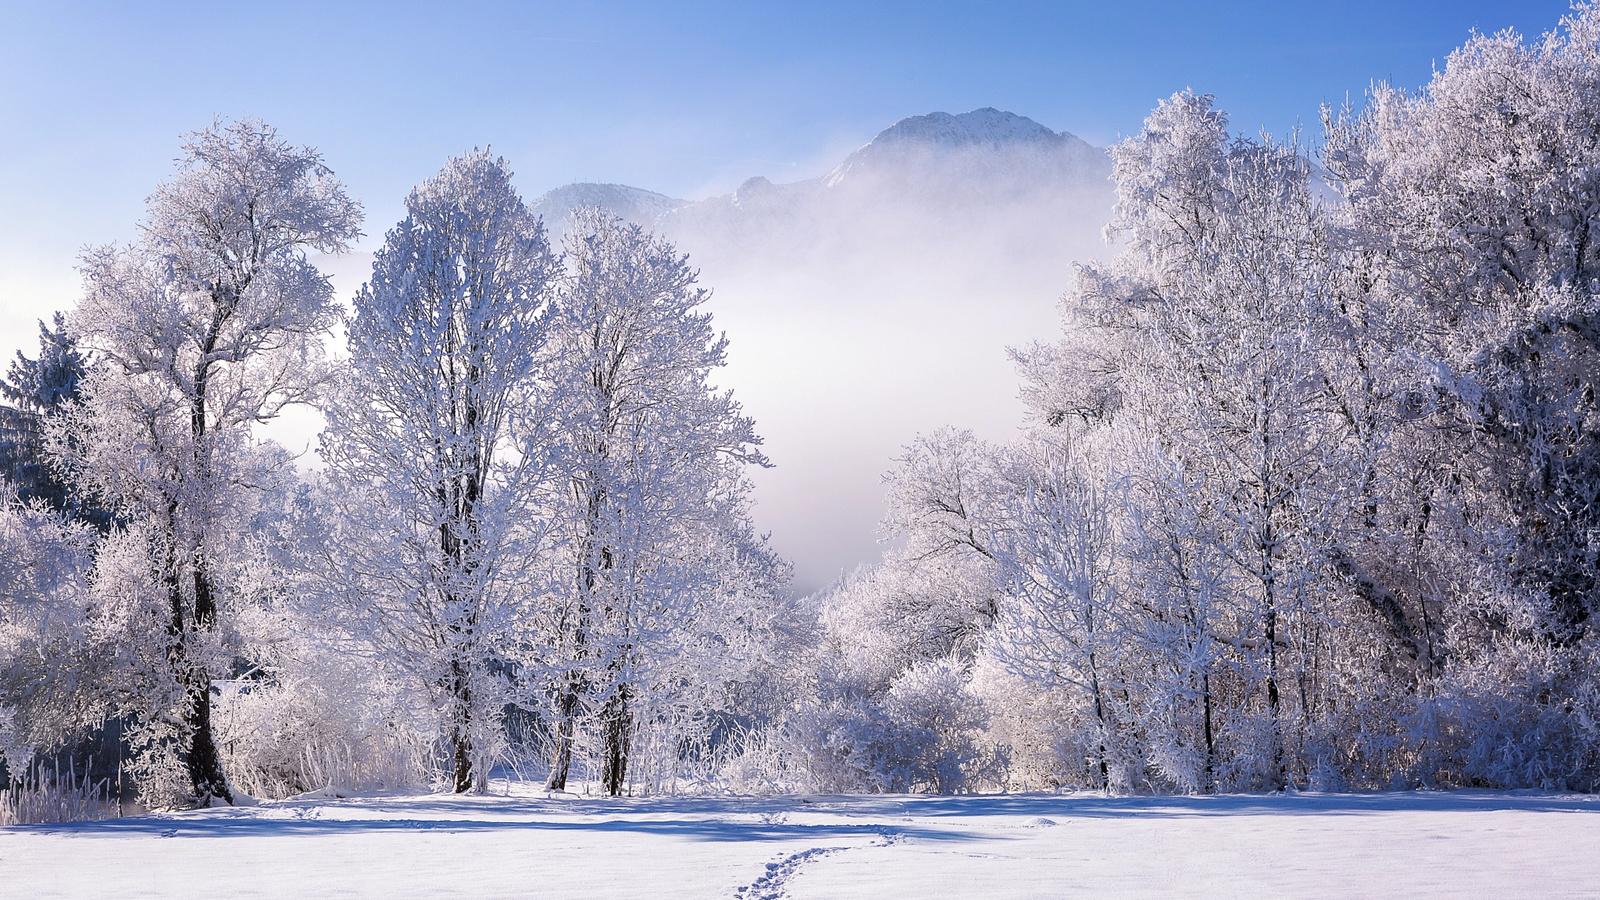 florian warnecke, пейзаж, бавария, деревья, германия, природа, зима, горы, снег, туман, тропинка